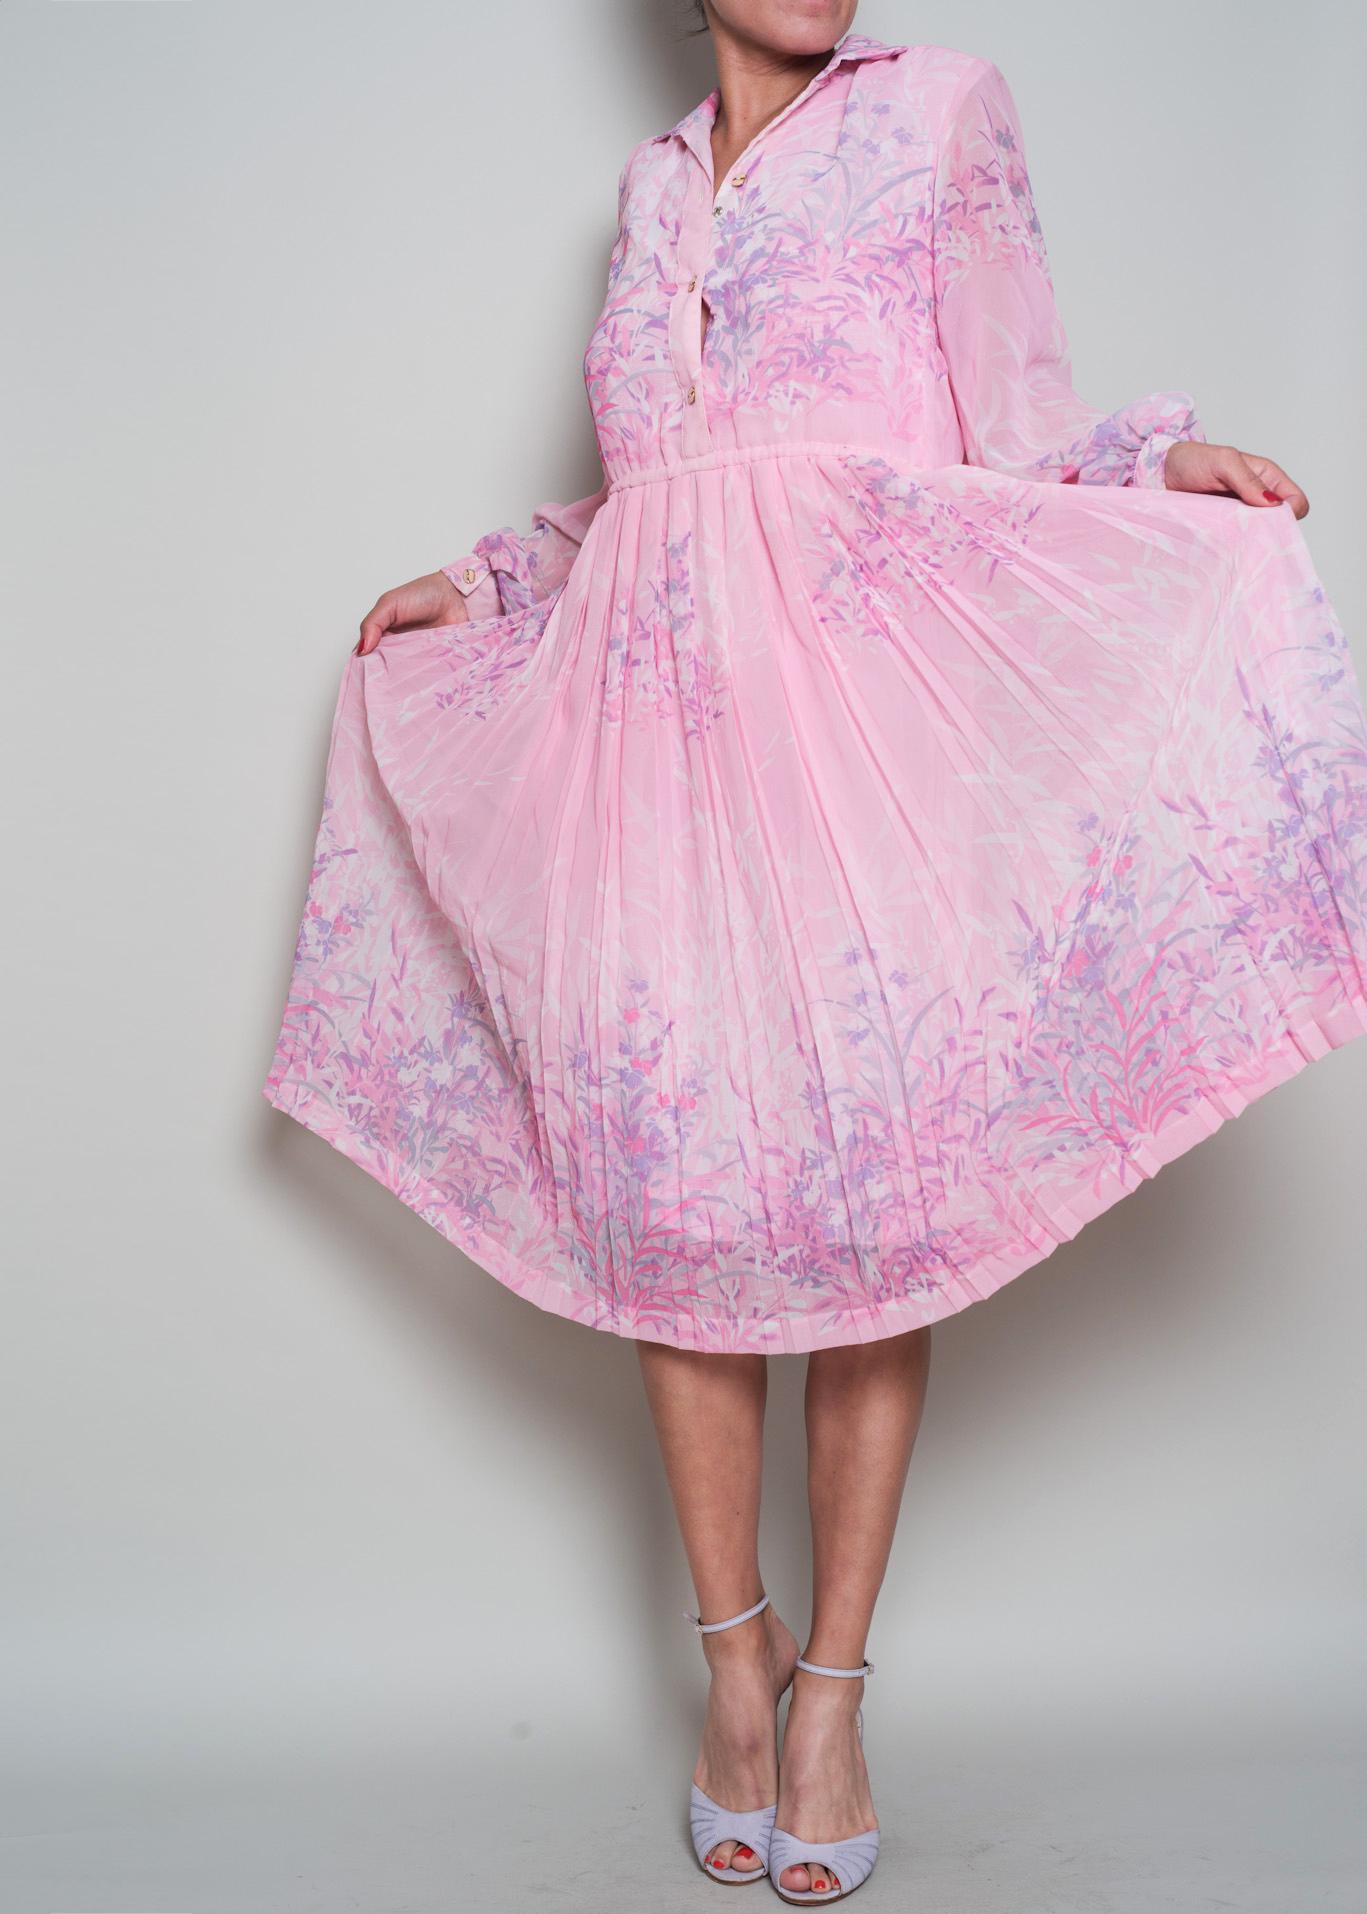 A_Part_of_the_Rest_Vintage_1970s_Pastel_Pink_Floral_Chiffon_Shirt_Dress005.jpg